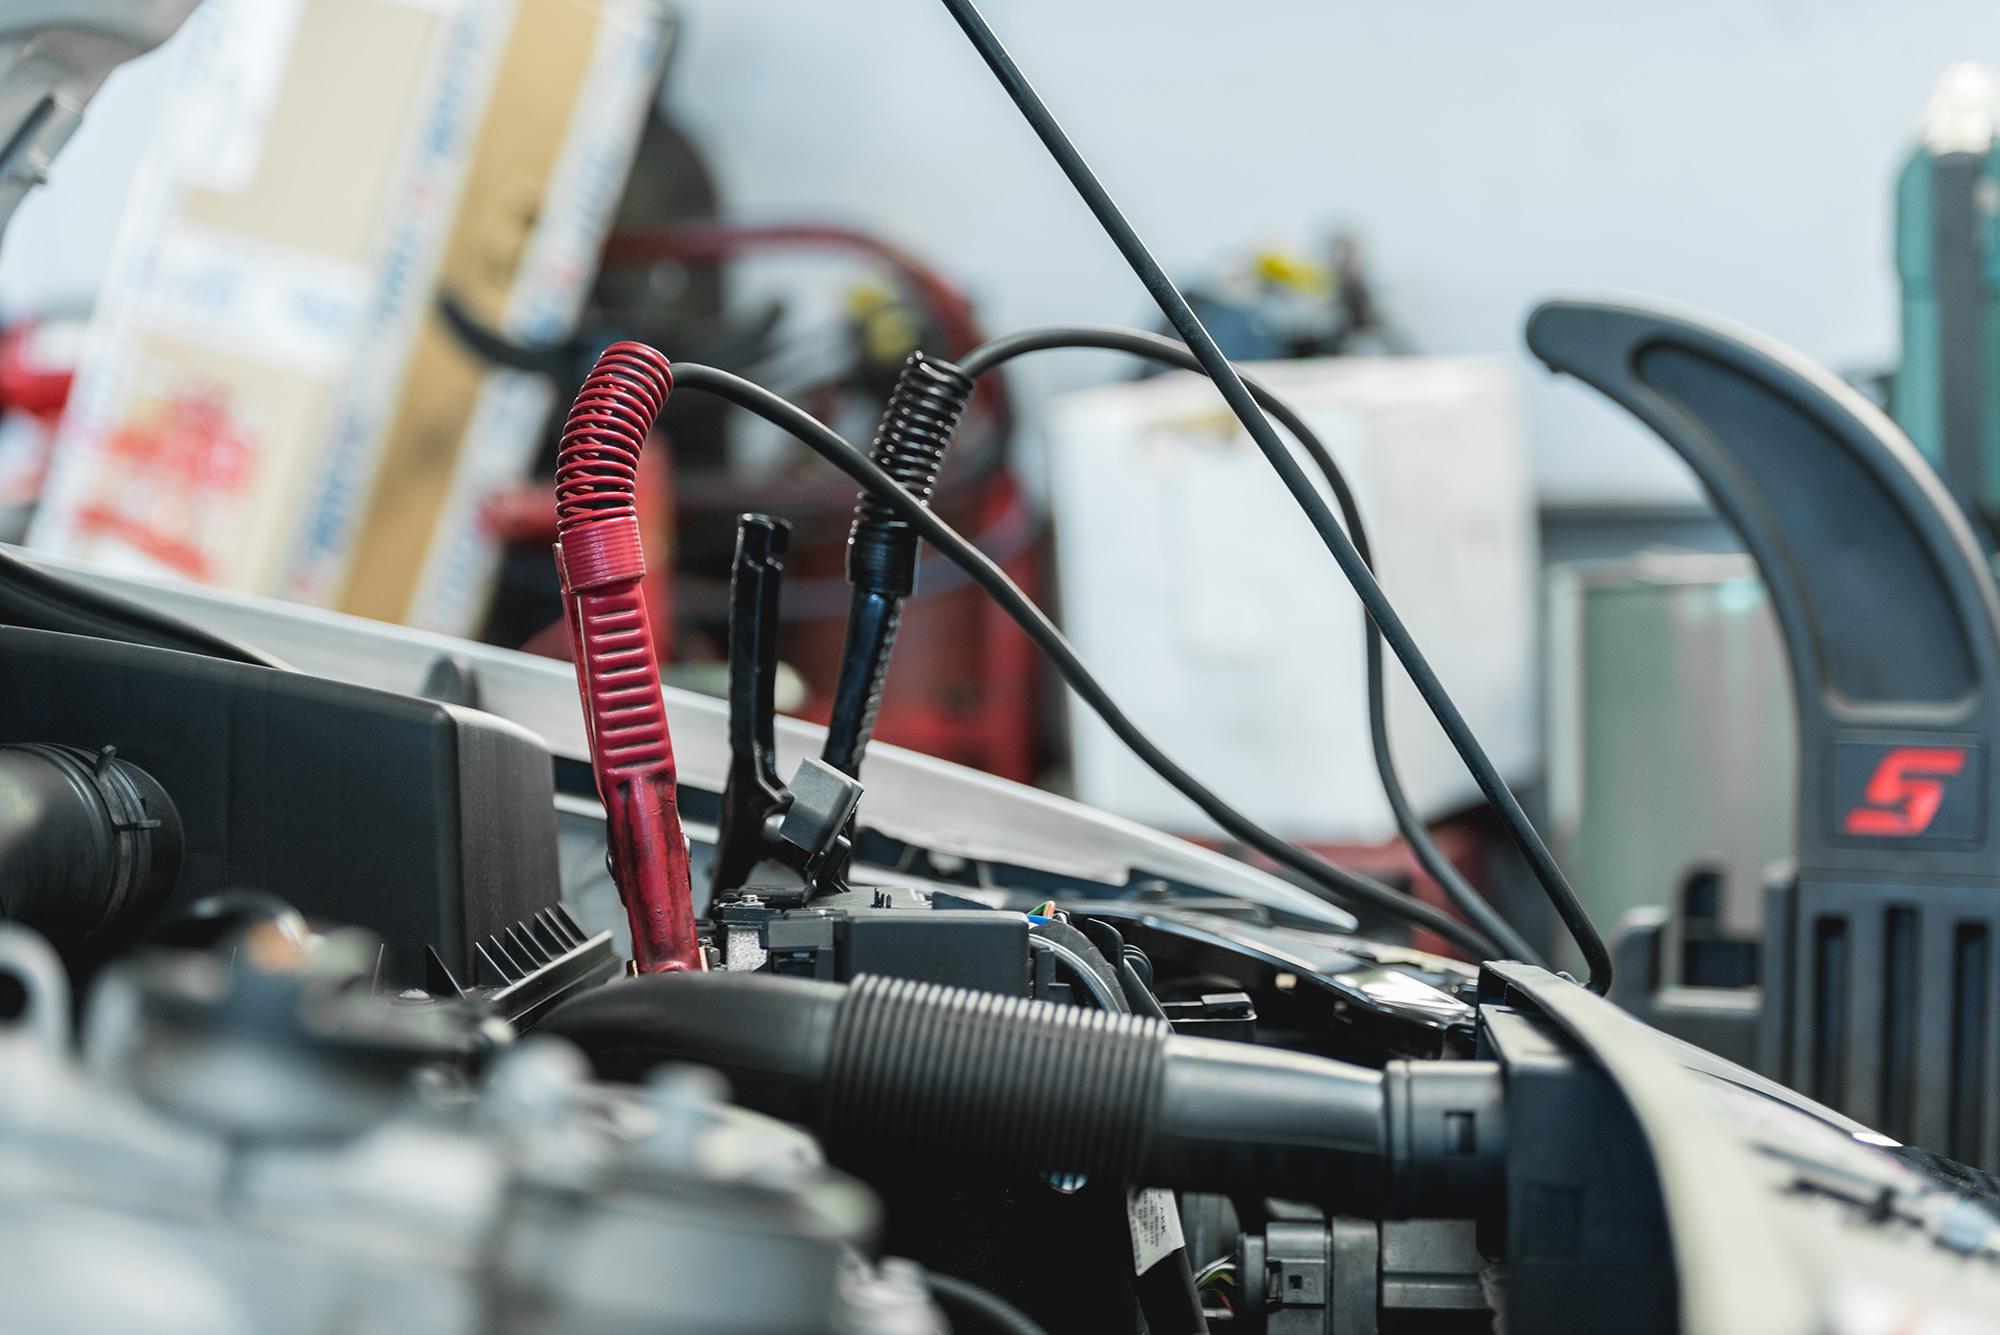 car-service-photography-engine.jpg